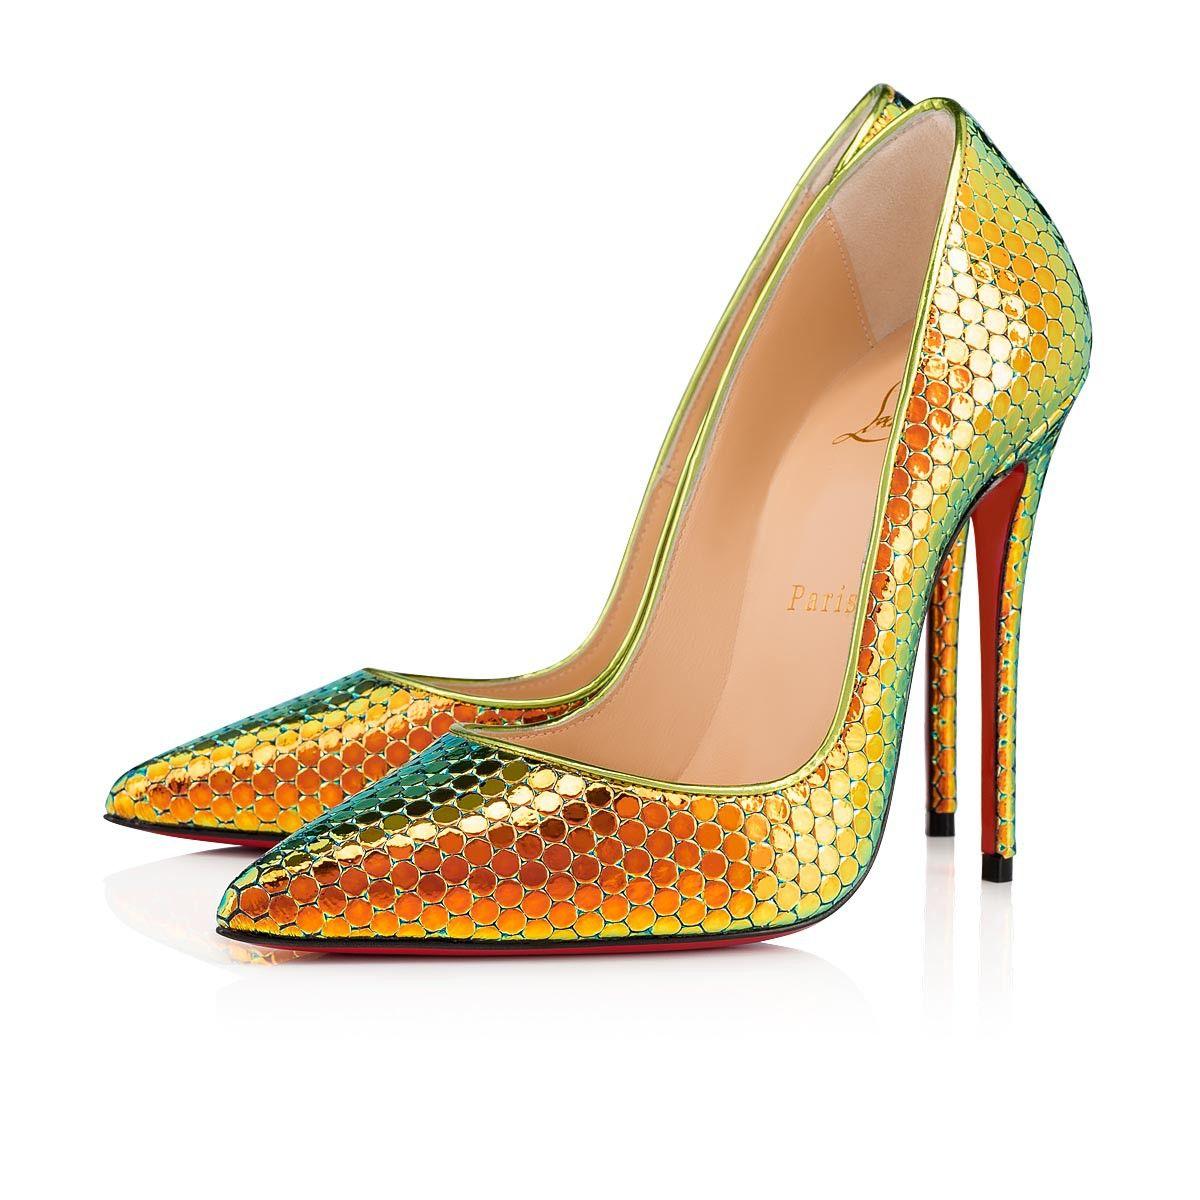 dcf9708bf55 So Kate 120 Taiga Specchio Ruche - Women Shoes - Christian Louboutin ...